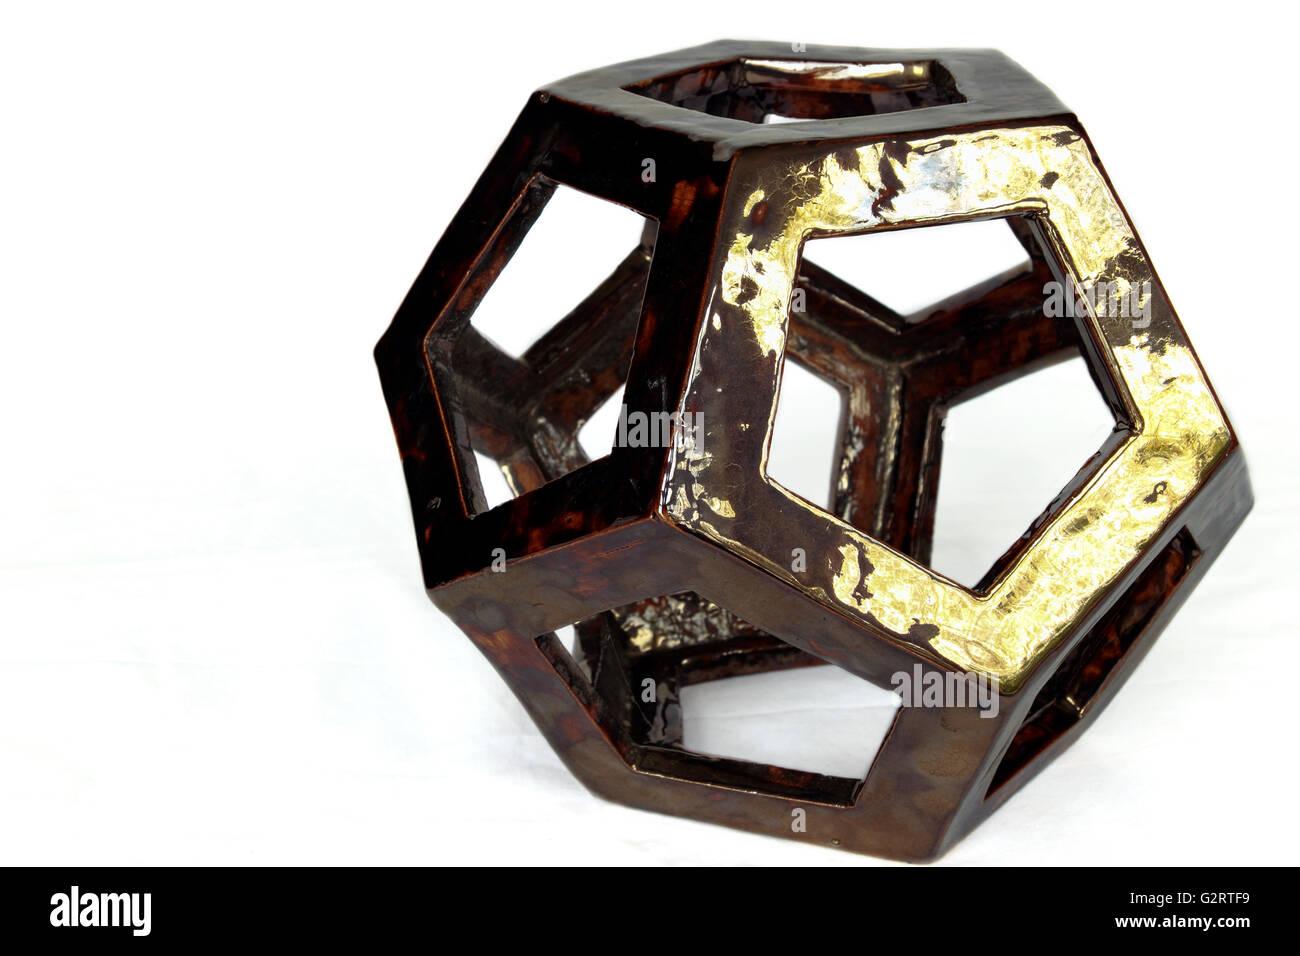 ceramic decahedron sculpture pottery stock photo 105015661 alamy